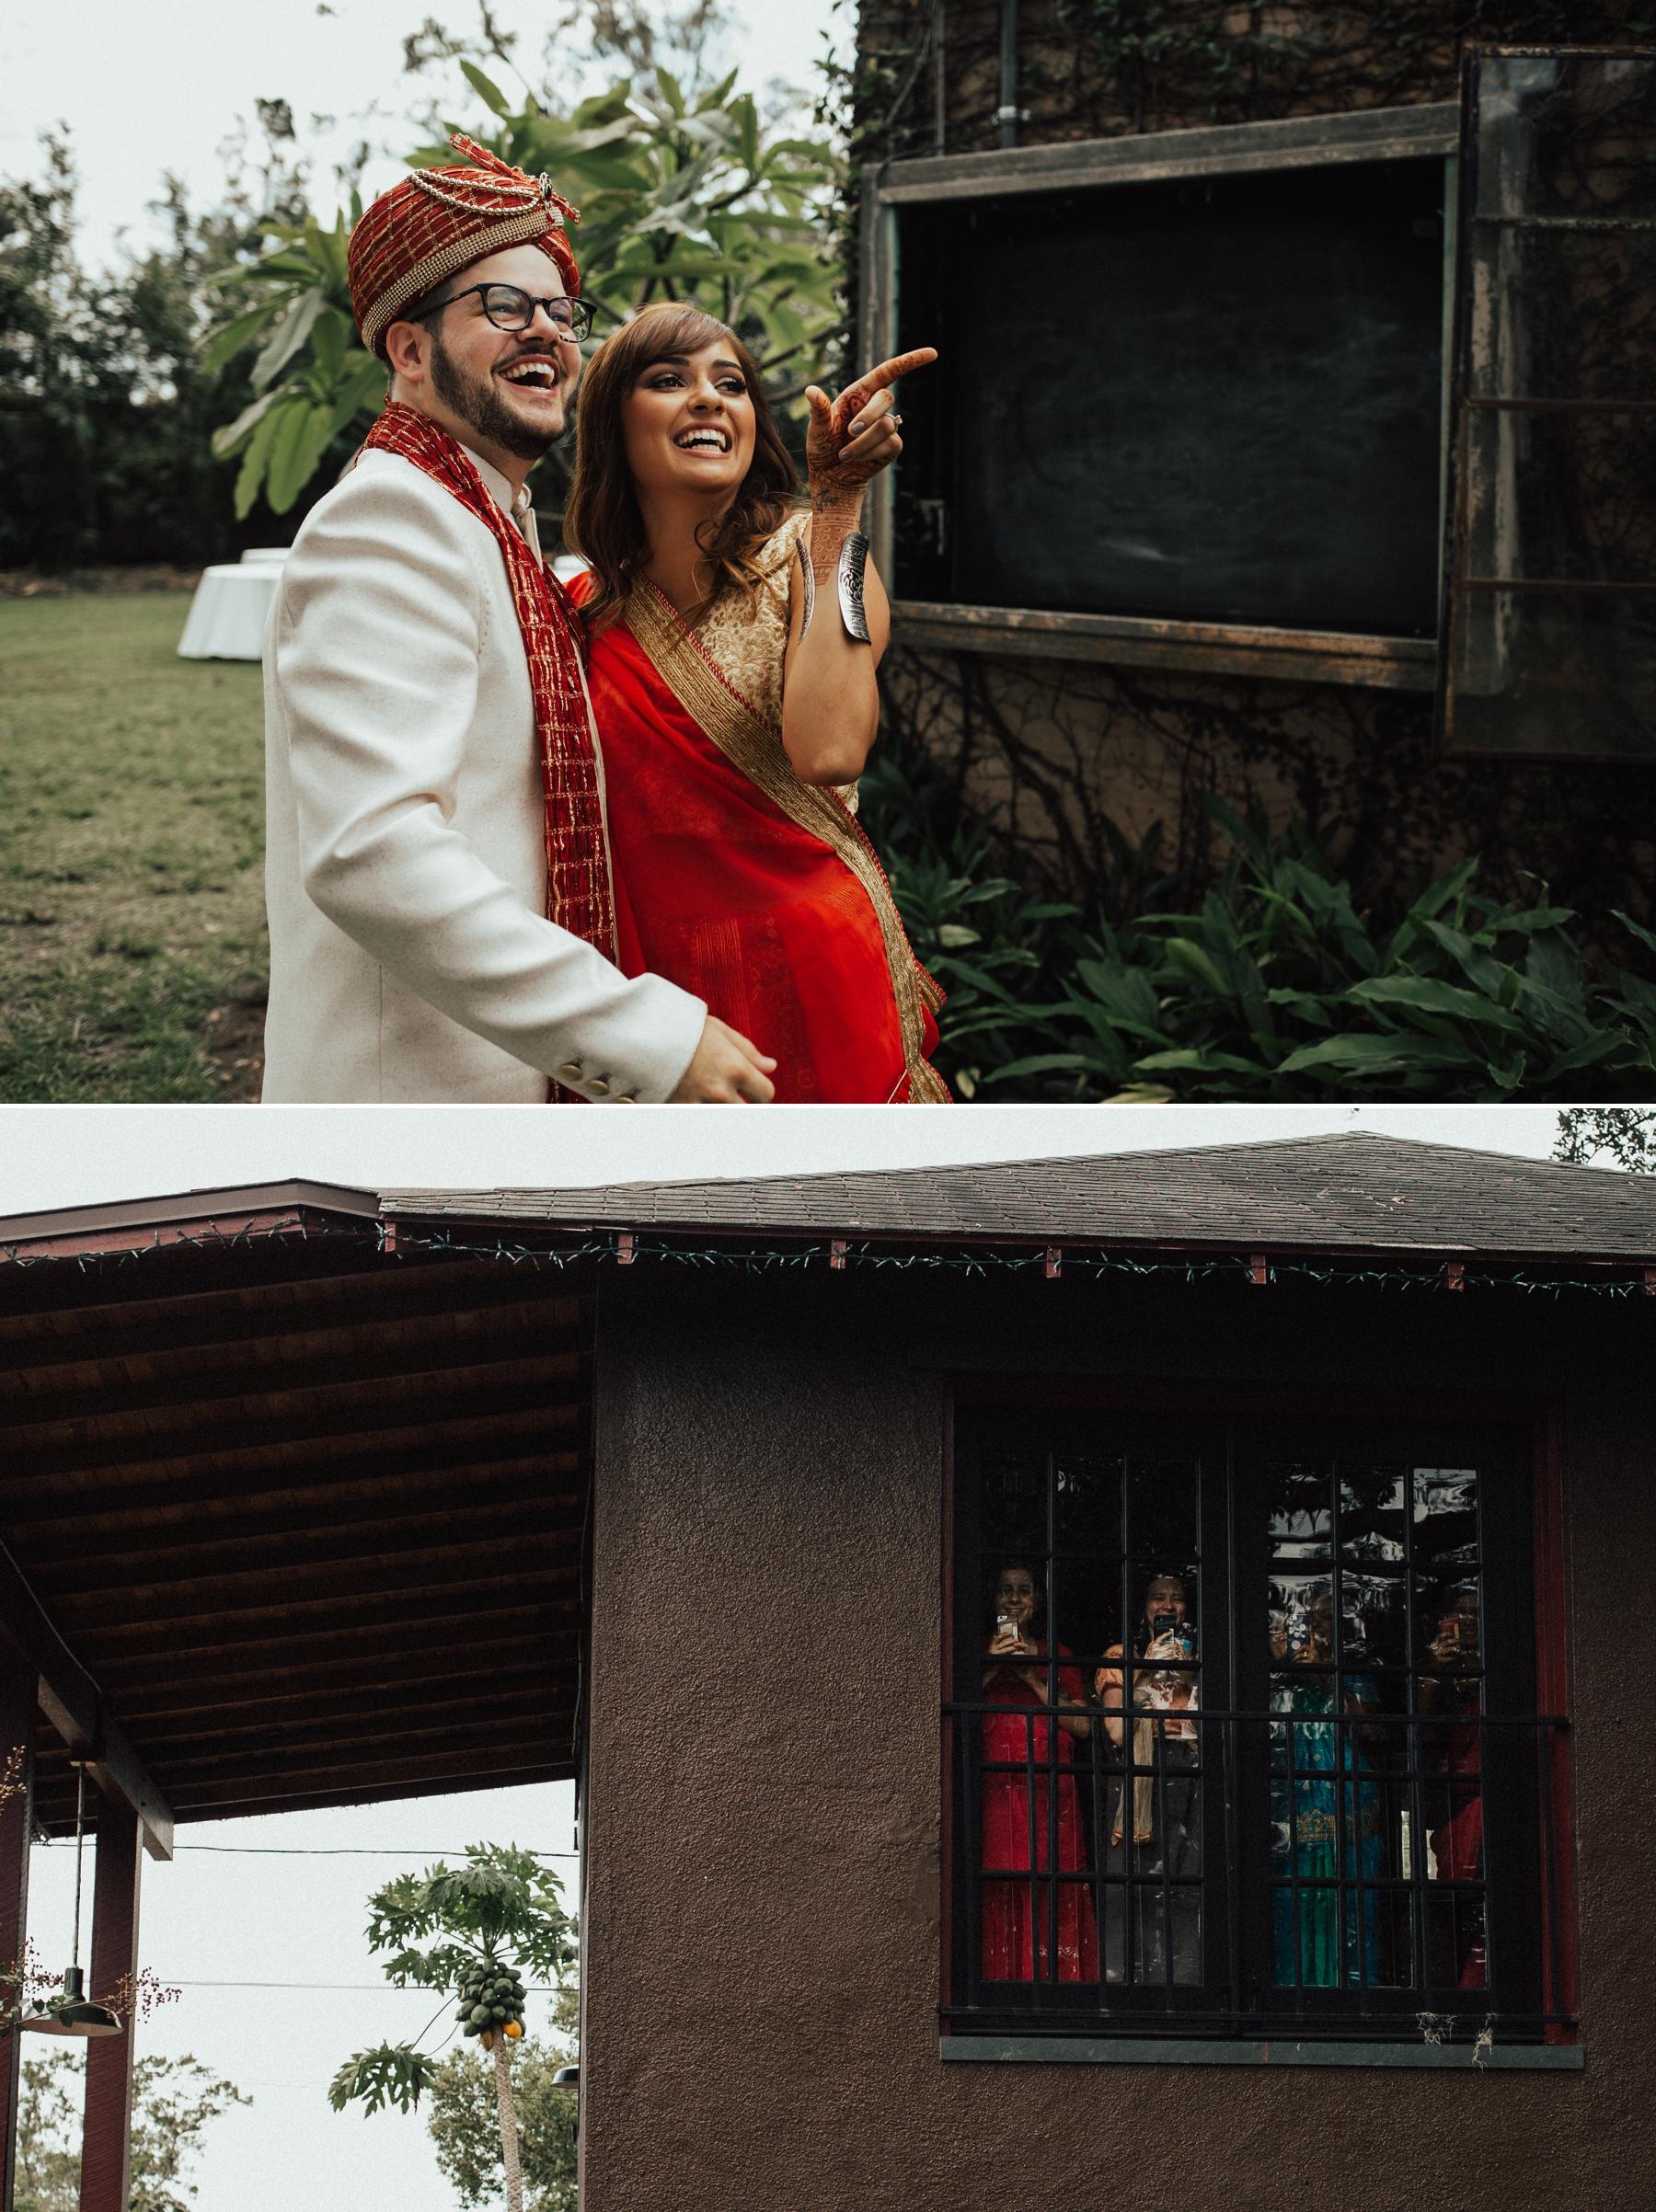 acre-wedding-orlando-29.jpg